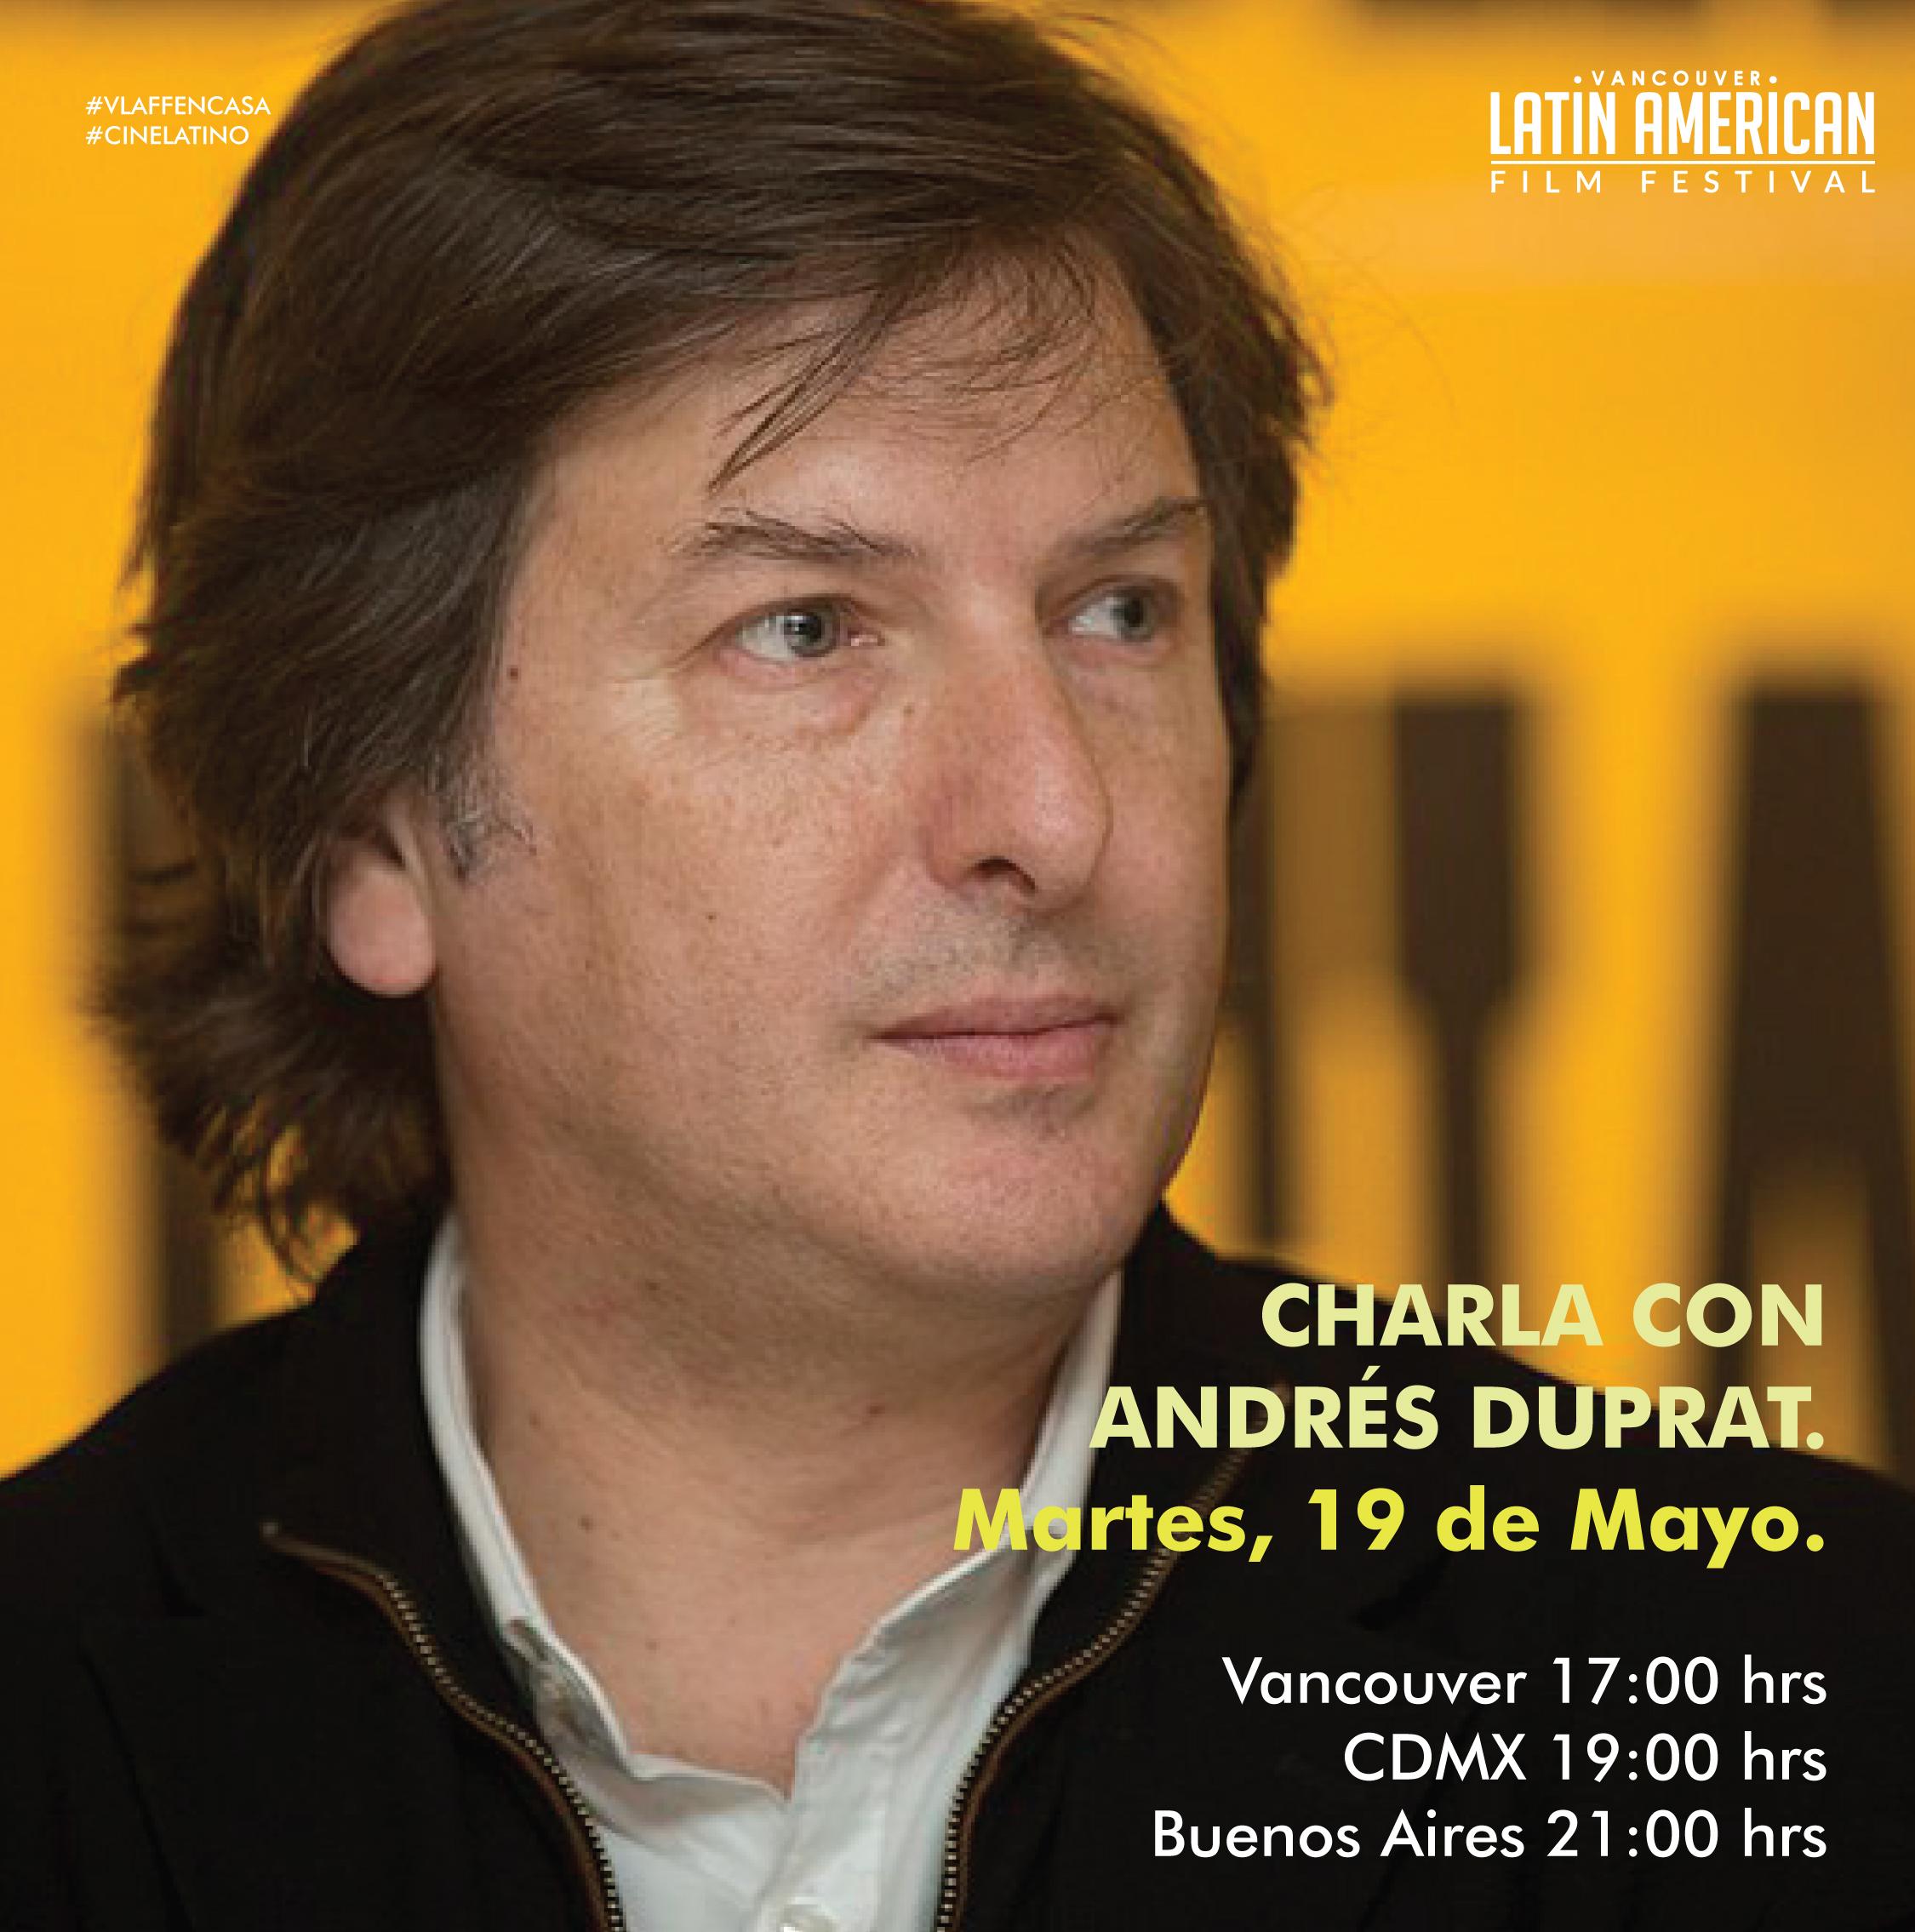 CHARLA CON ANDRÉS DUPRAT, Guionista Argentino.